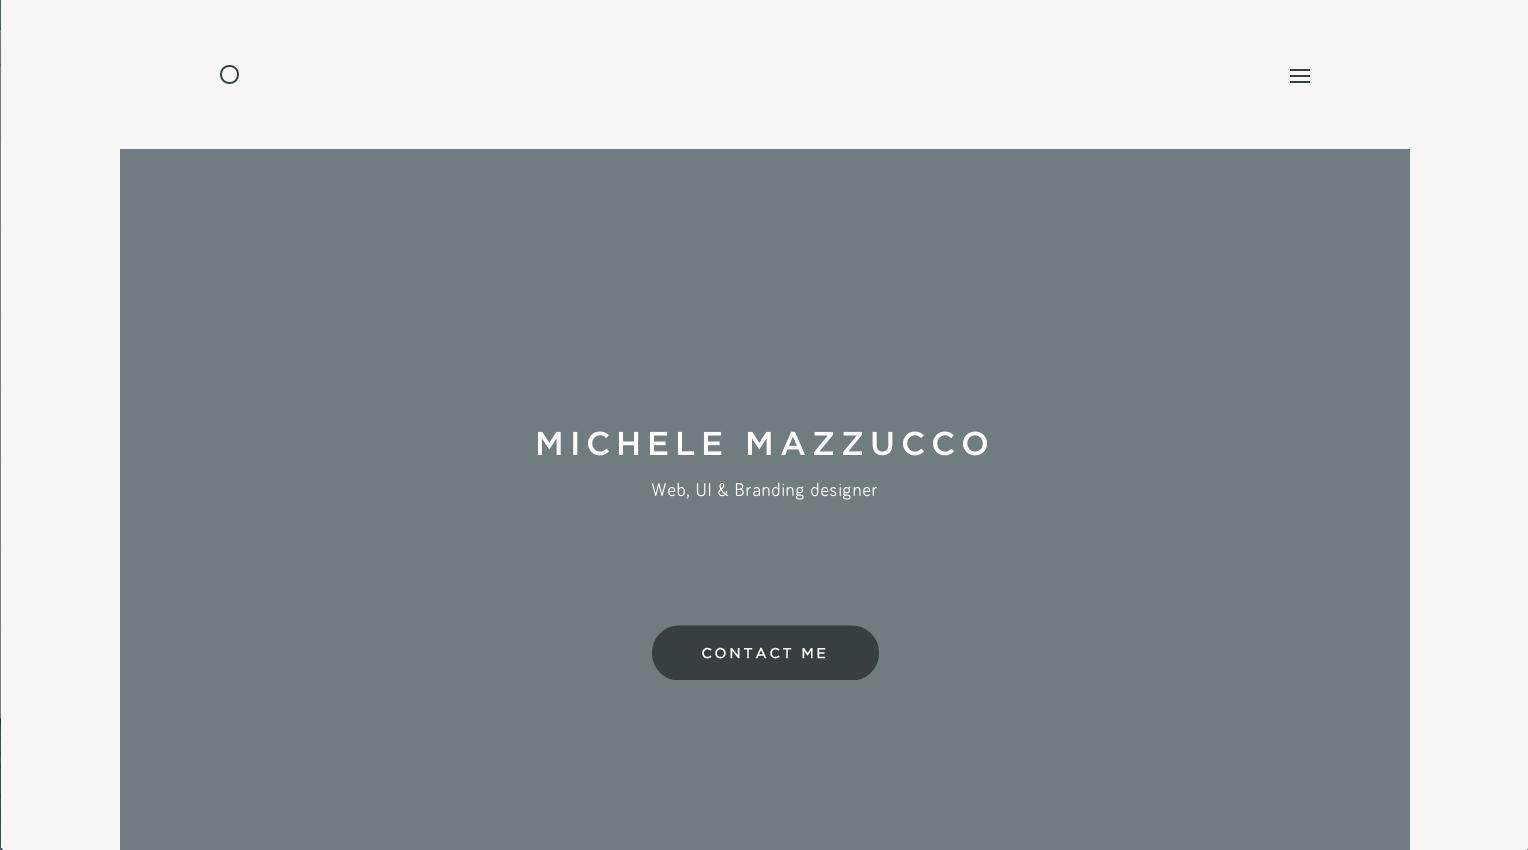 diseño web ancho centrado